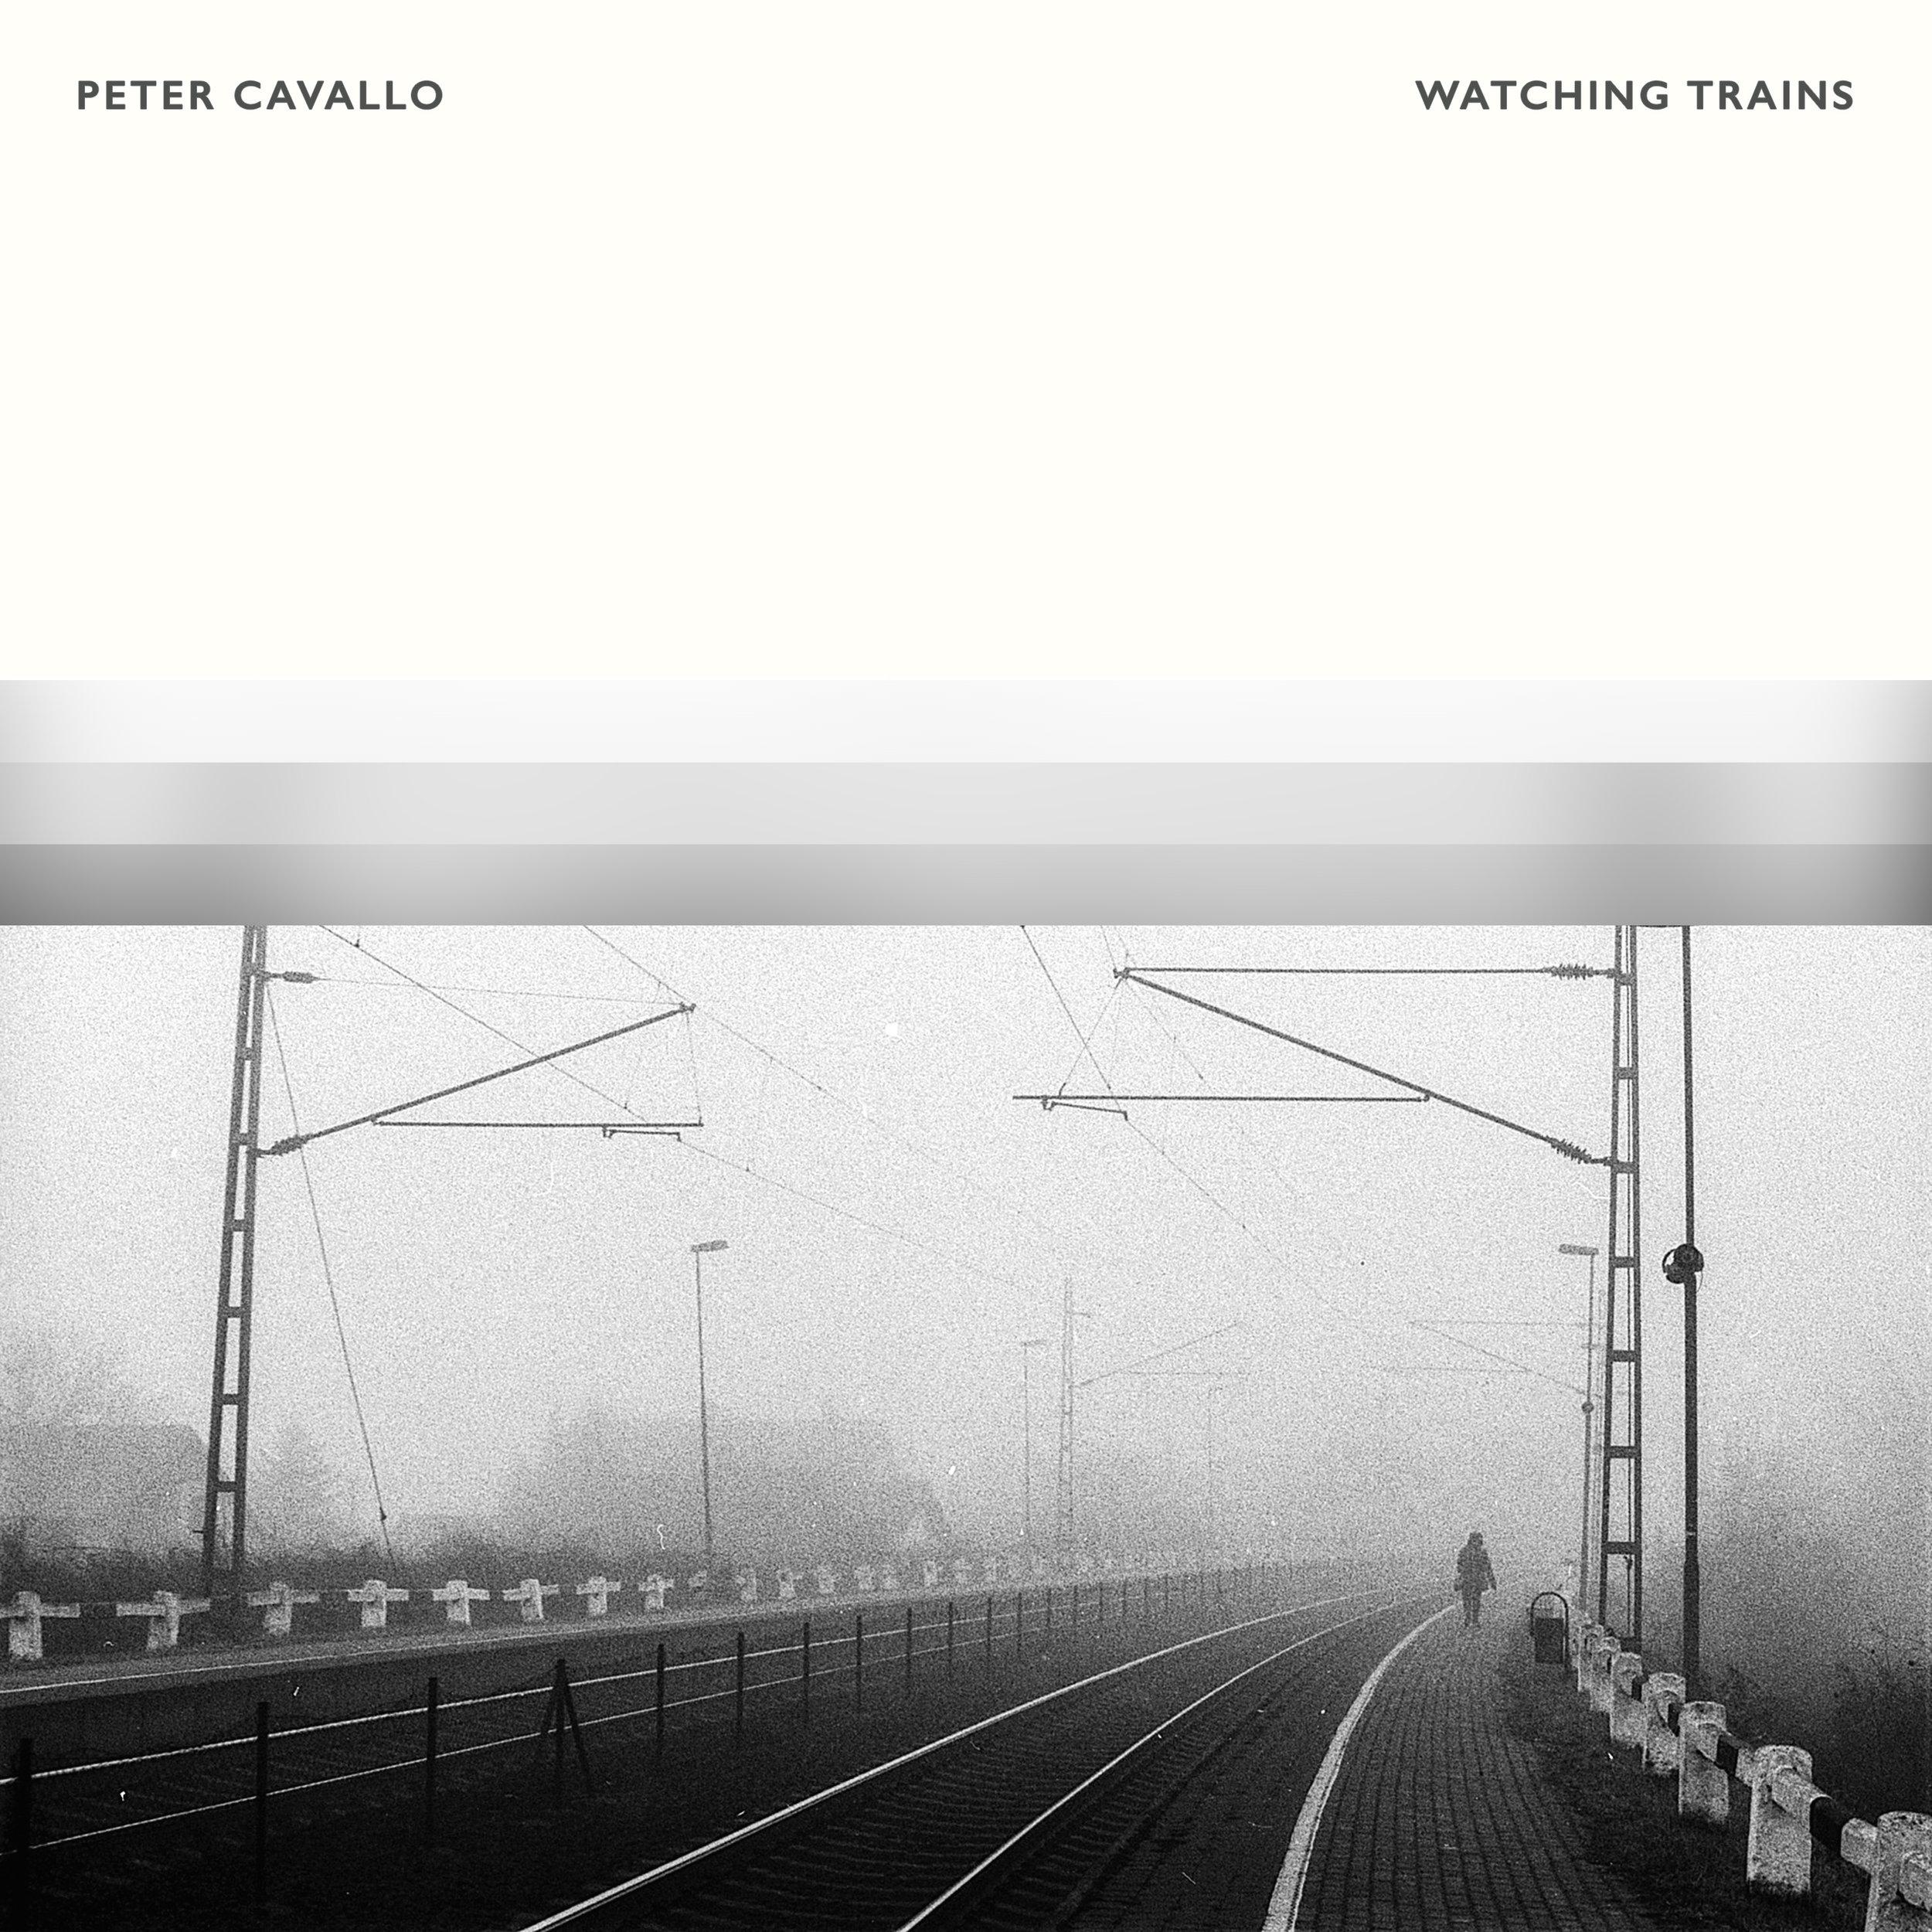 Peter Cavallo - Watching Trains